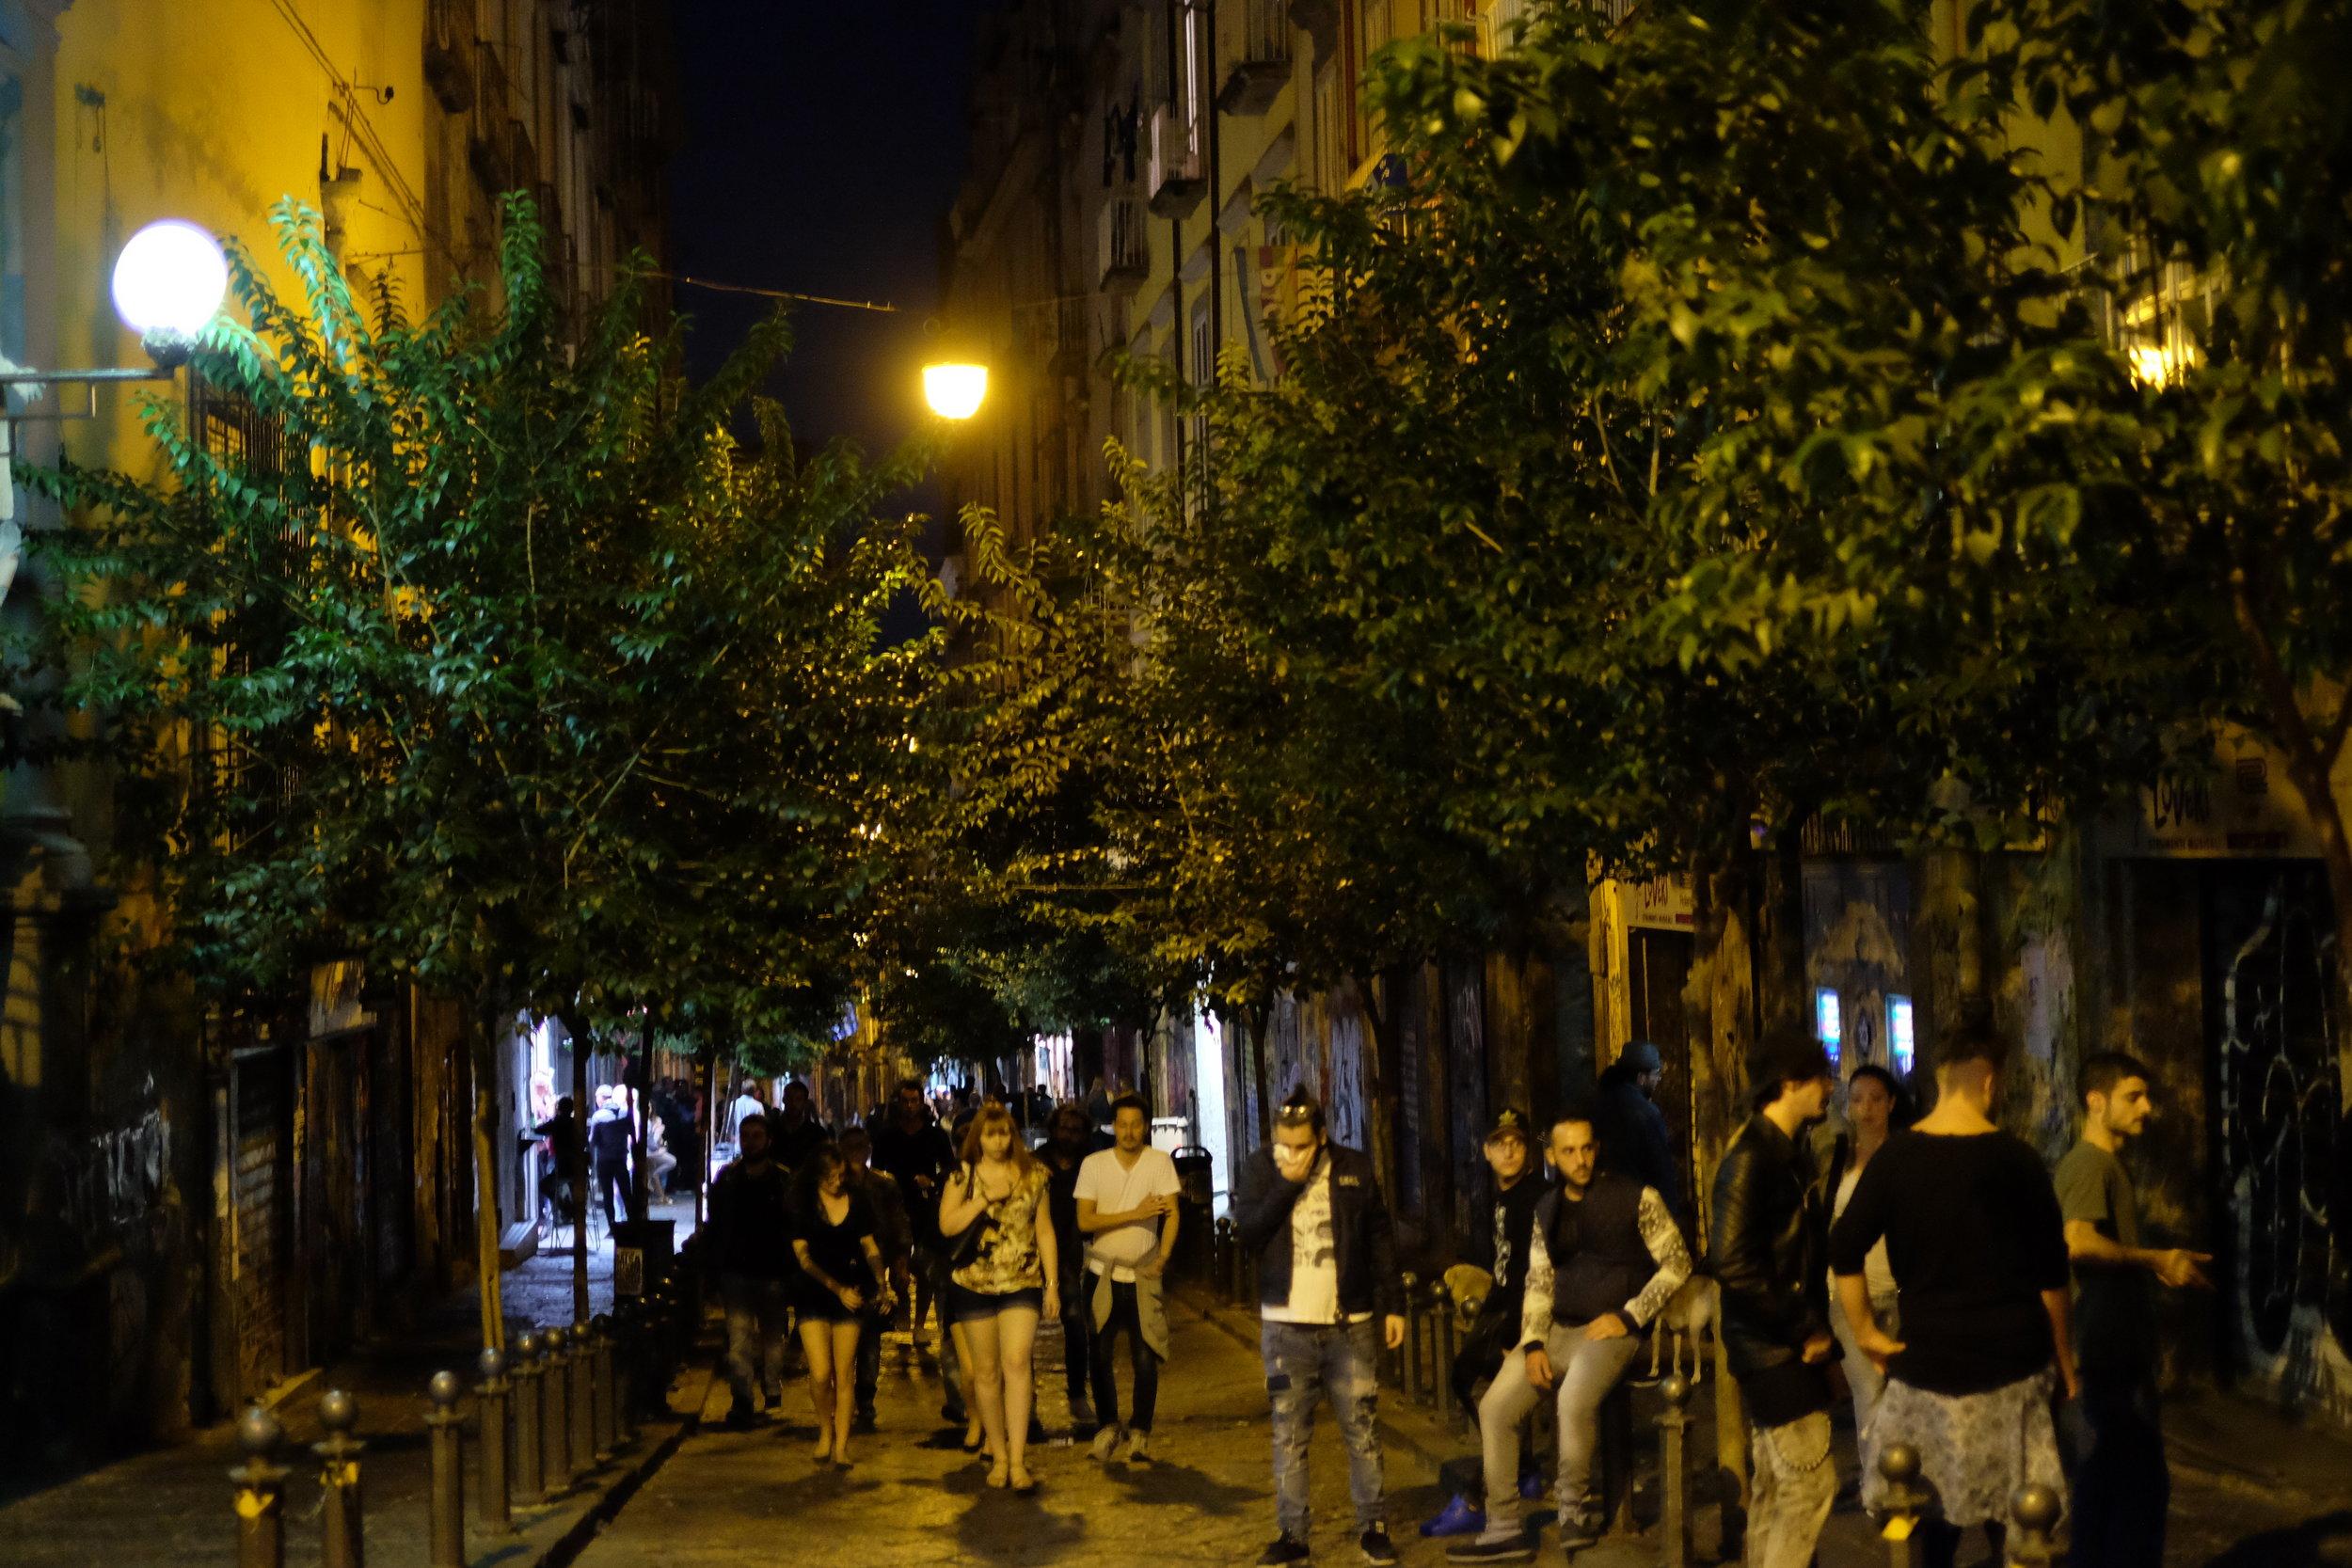 San Sebastiano street at night.